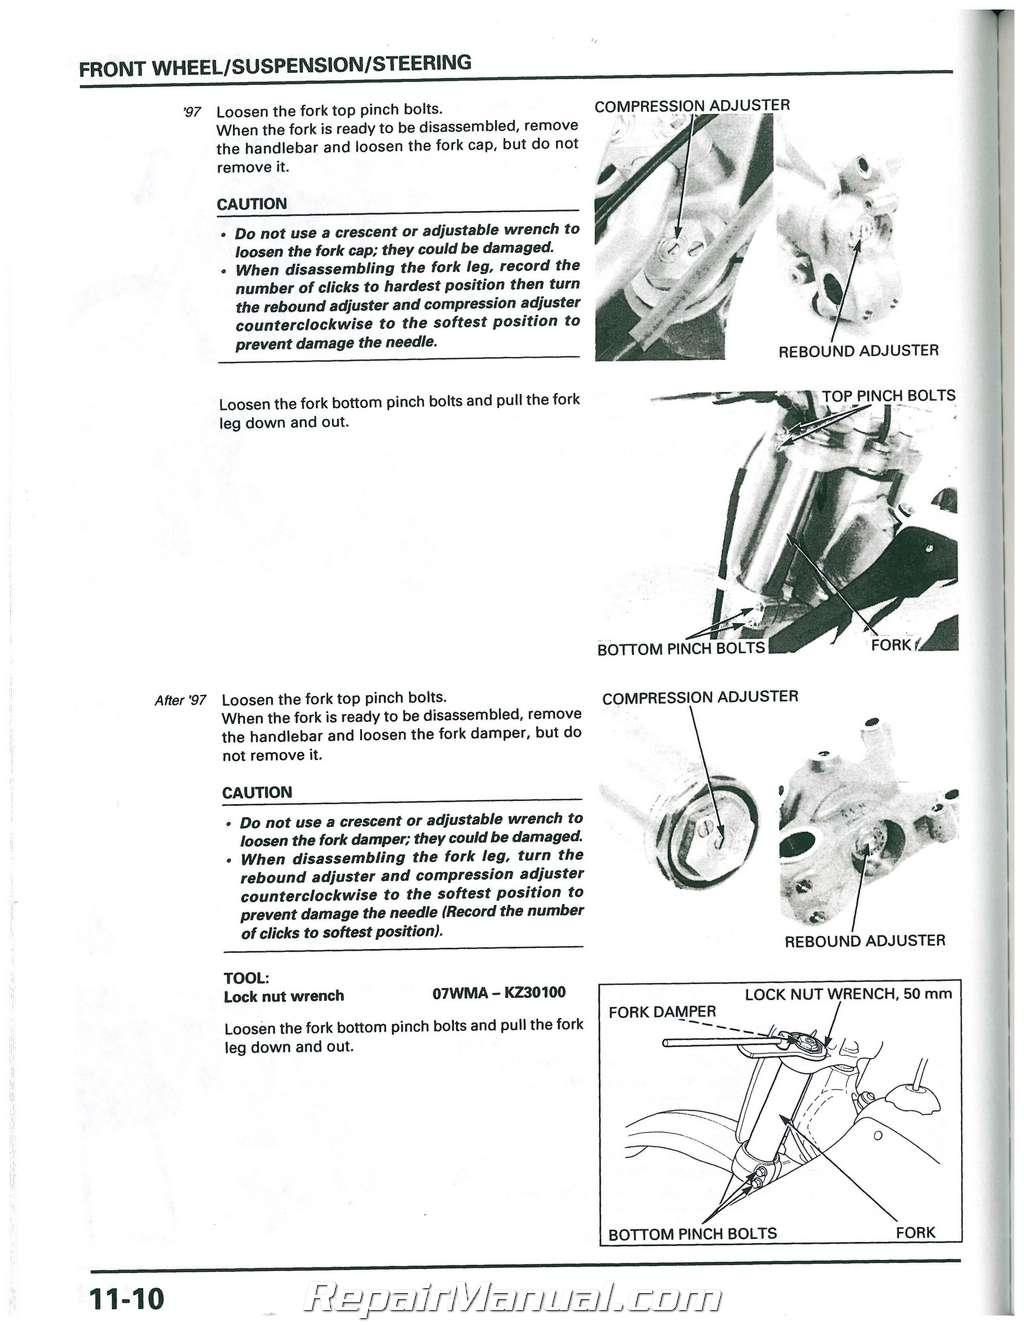 1997 1998 1999 Honda Cr250r Motorcycle Service Manual